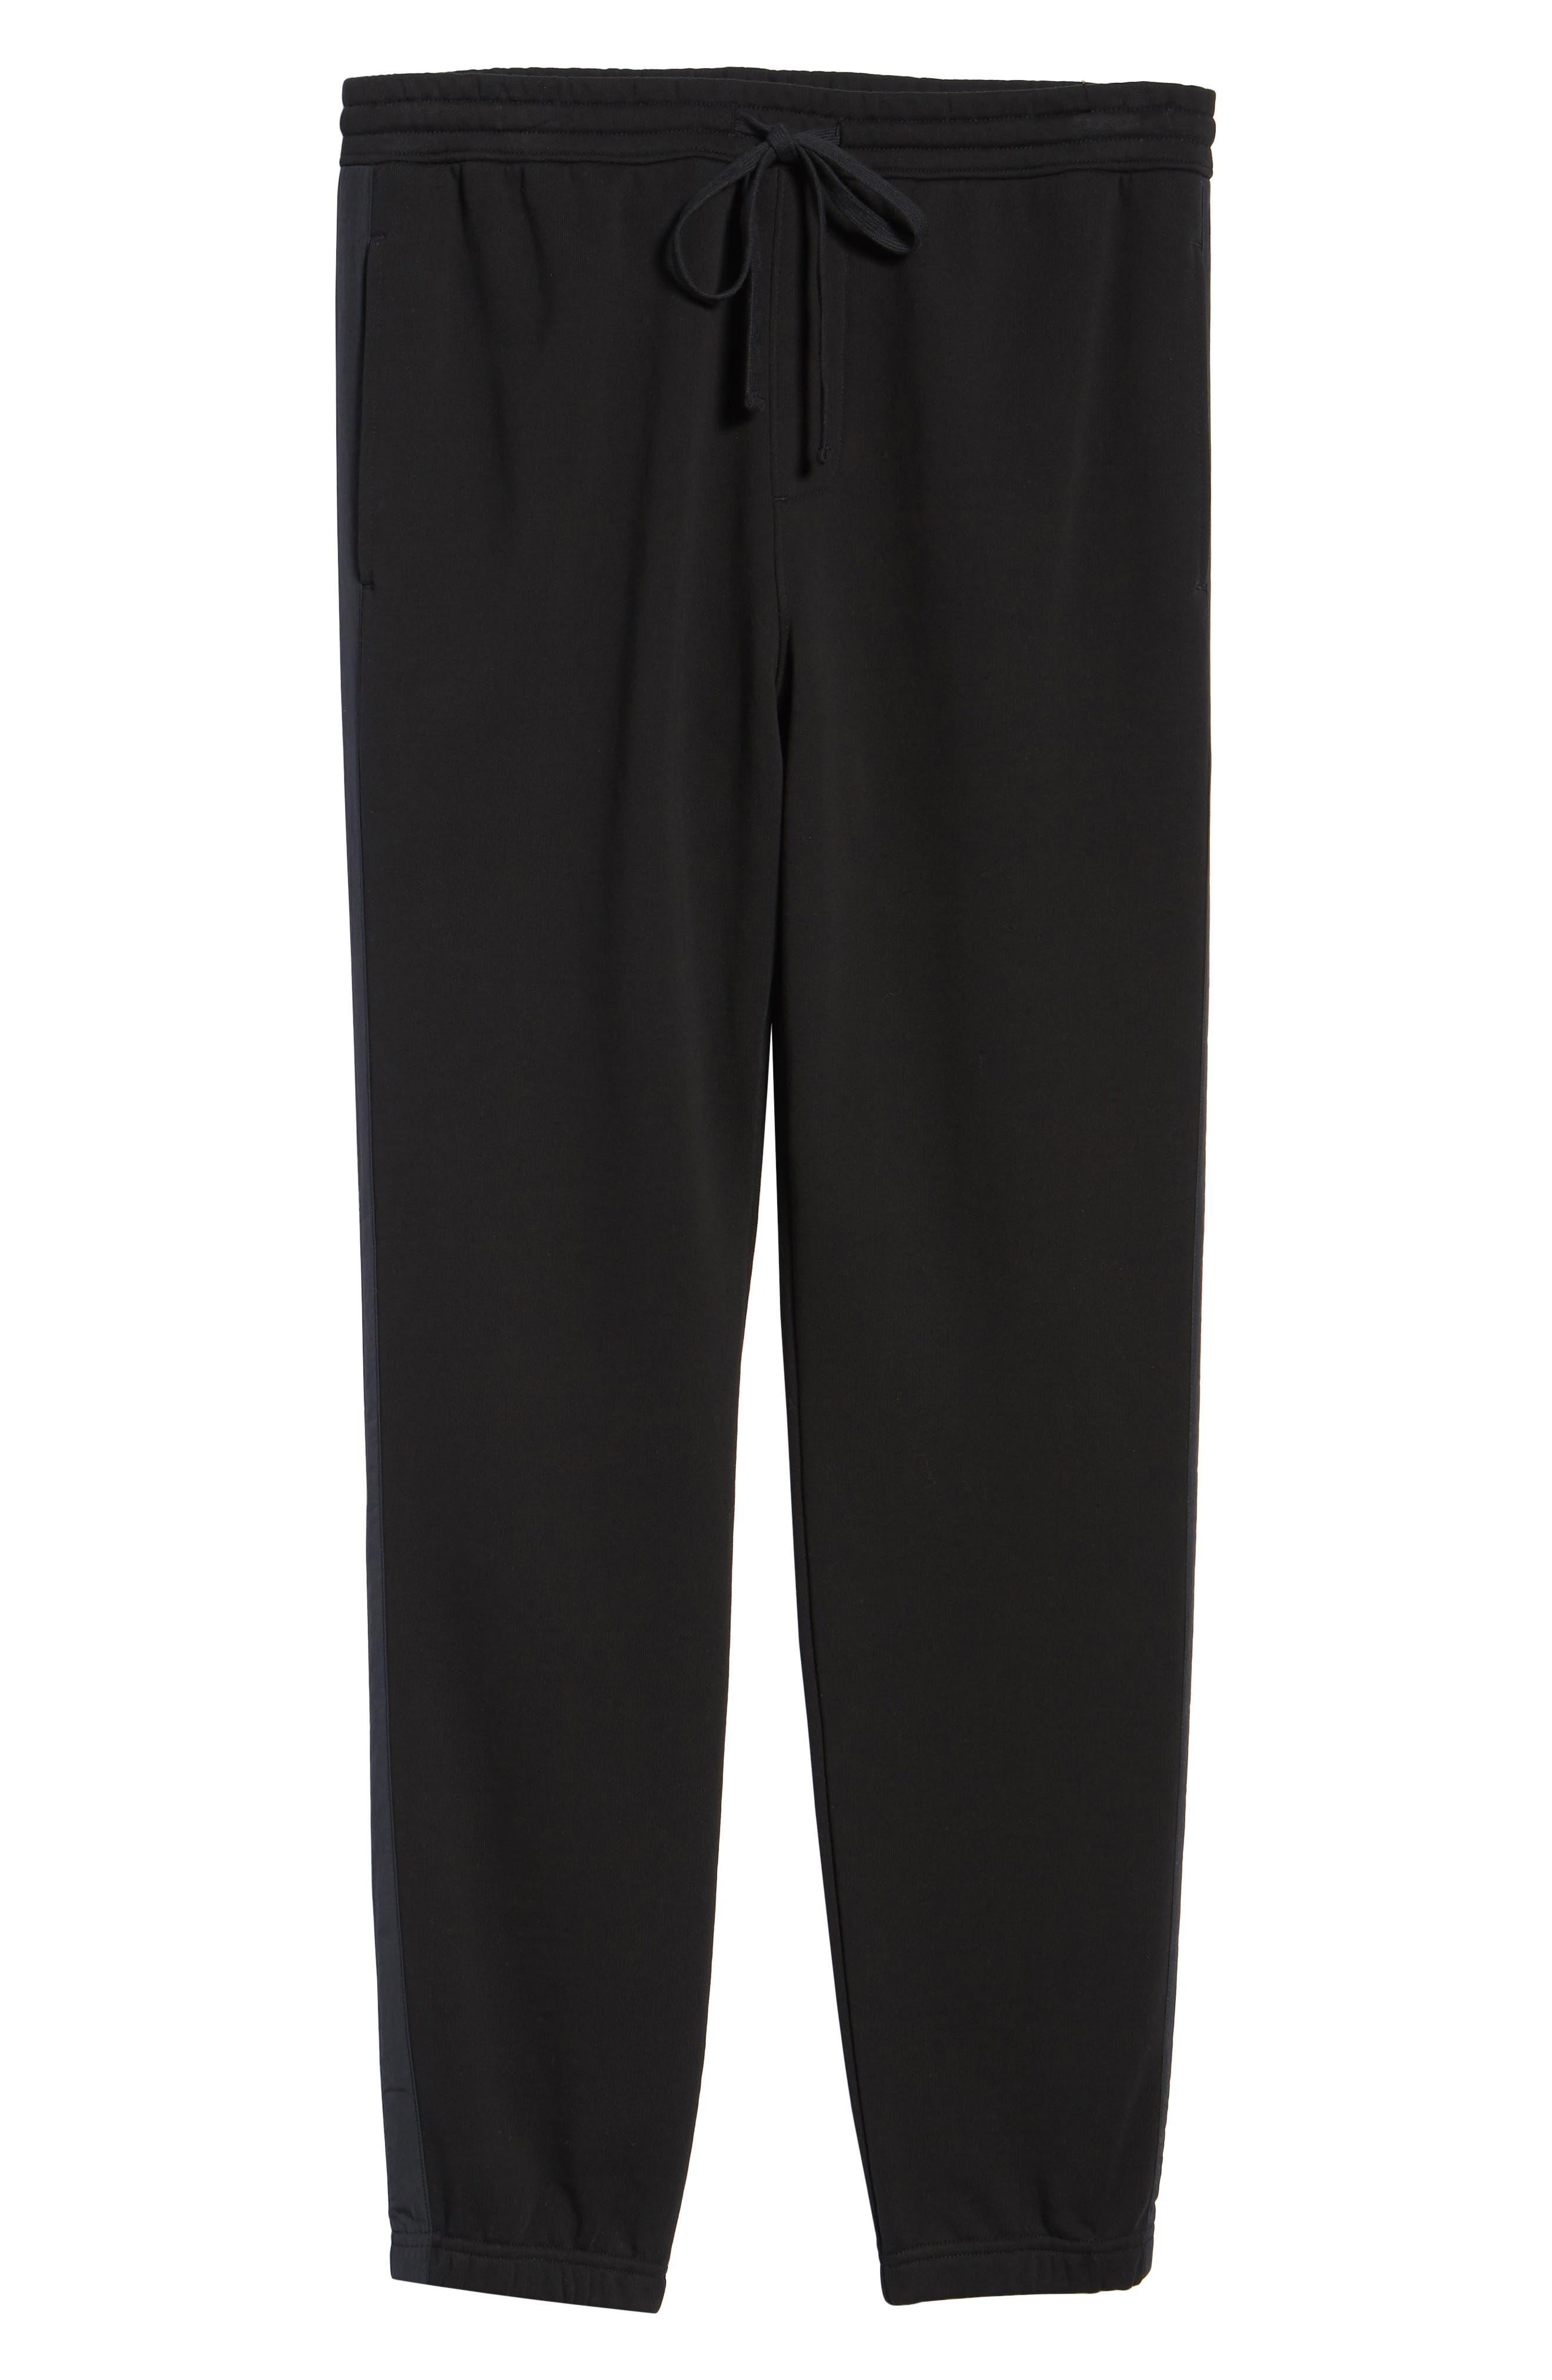 Mix Media Regular Fit Cotton Sweatpants,                             Alternate thumbnail 6, color,                             Black